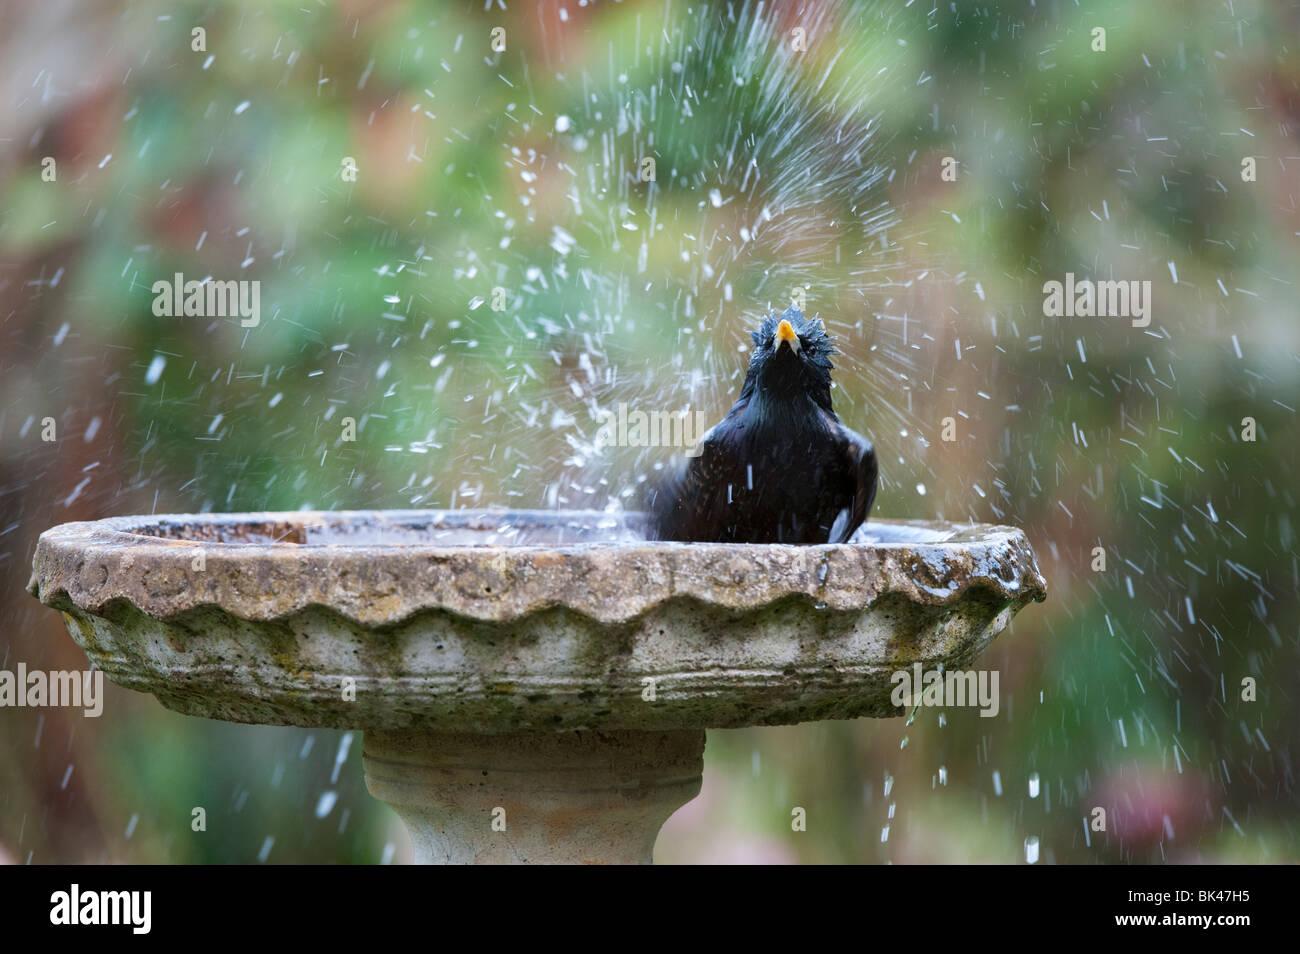 Sturnus vulgaris. Starling washing in a stone birdbath in the garden. UK - Stock Image